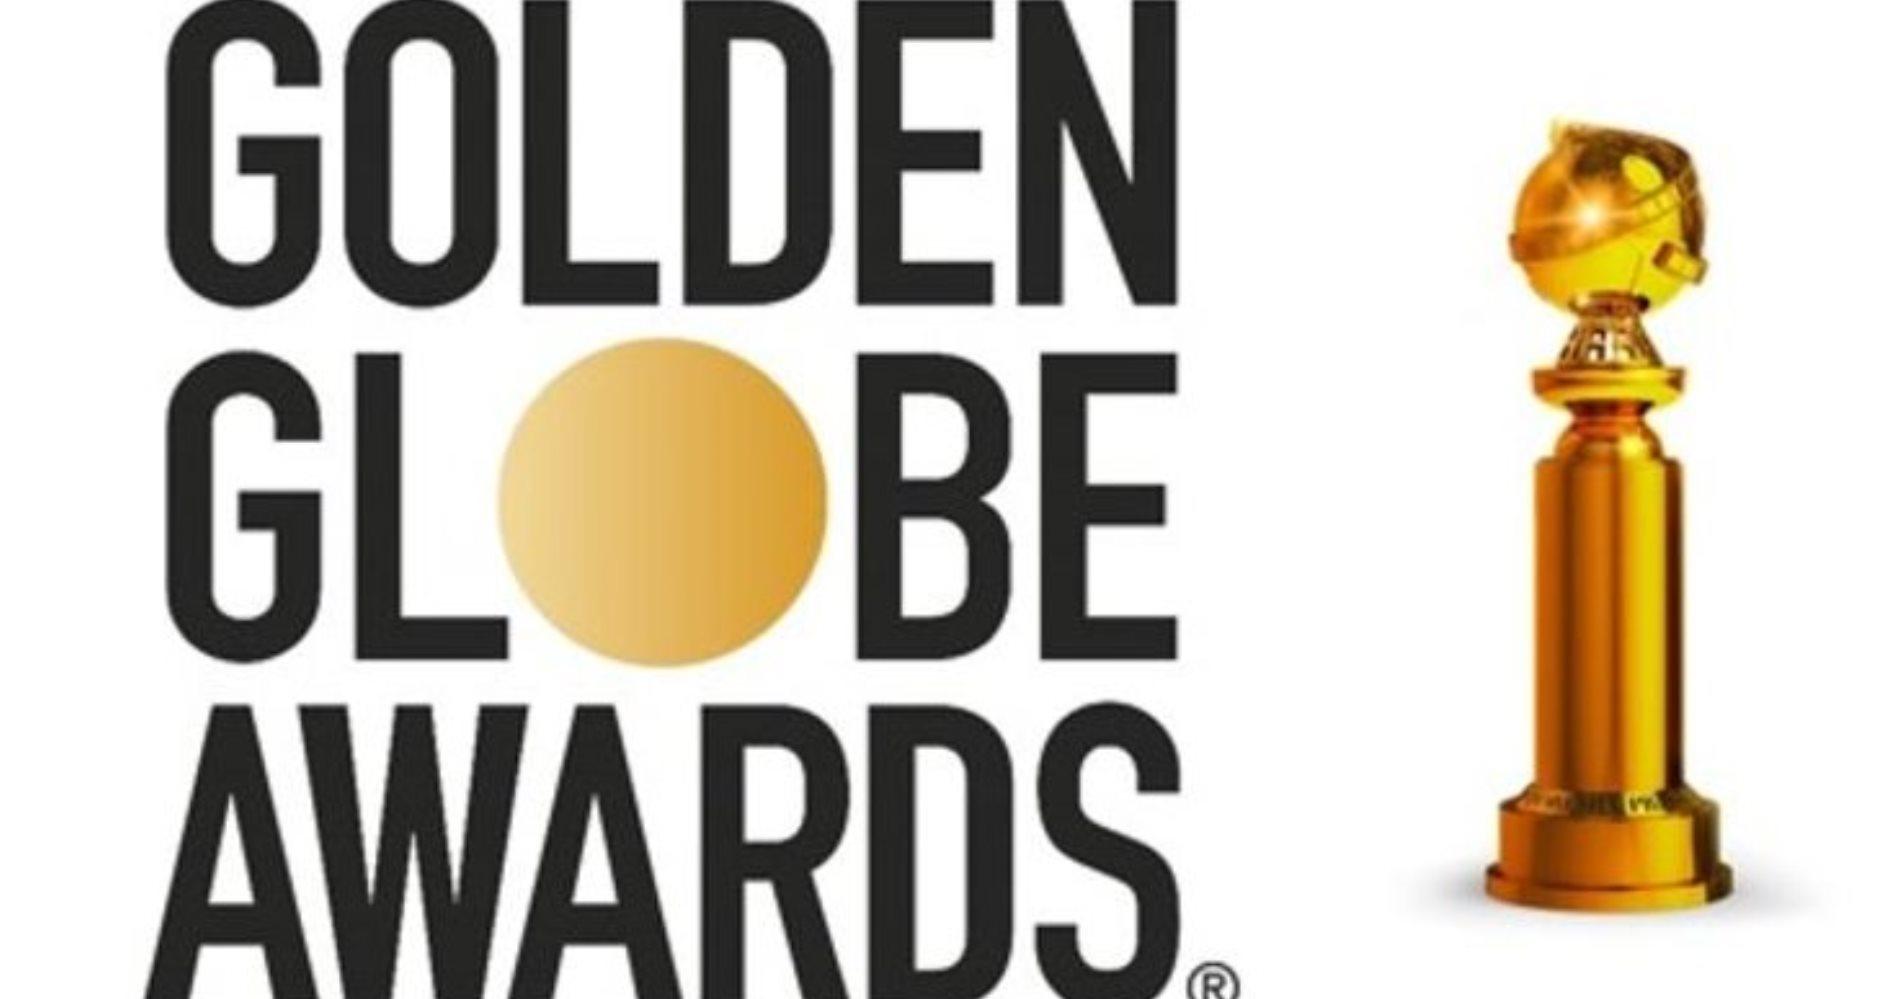 "<span class=""entry-title-primary"">Golden Globes 2020: Tutti i vincitori!</span> <span class=""entry-subtitle"">Tra i vincitori Phoenix, Waller Bridge, Tarantino, Pitt e tanti altri!</span>"